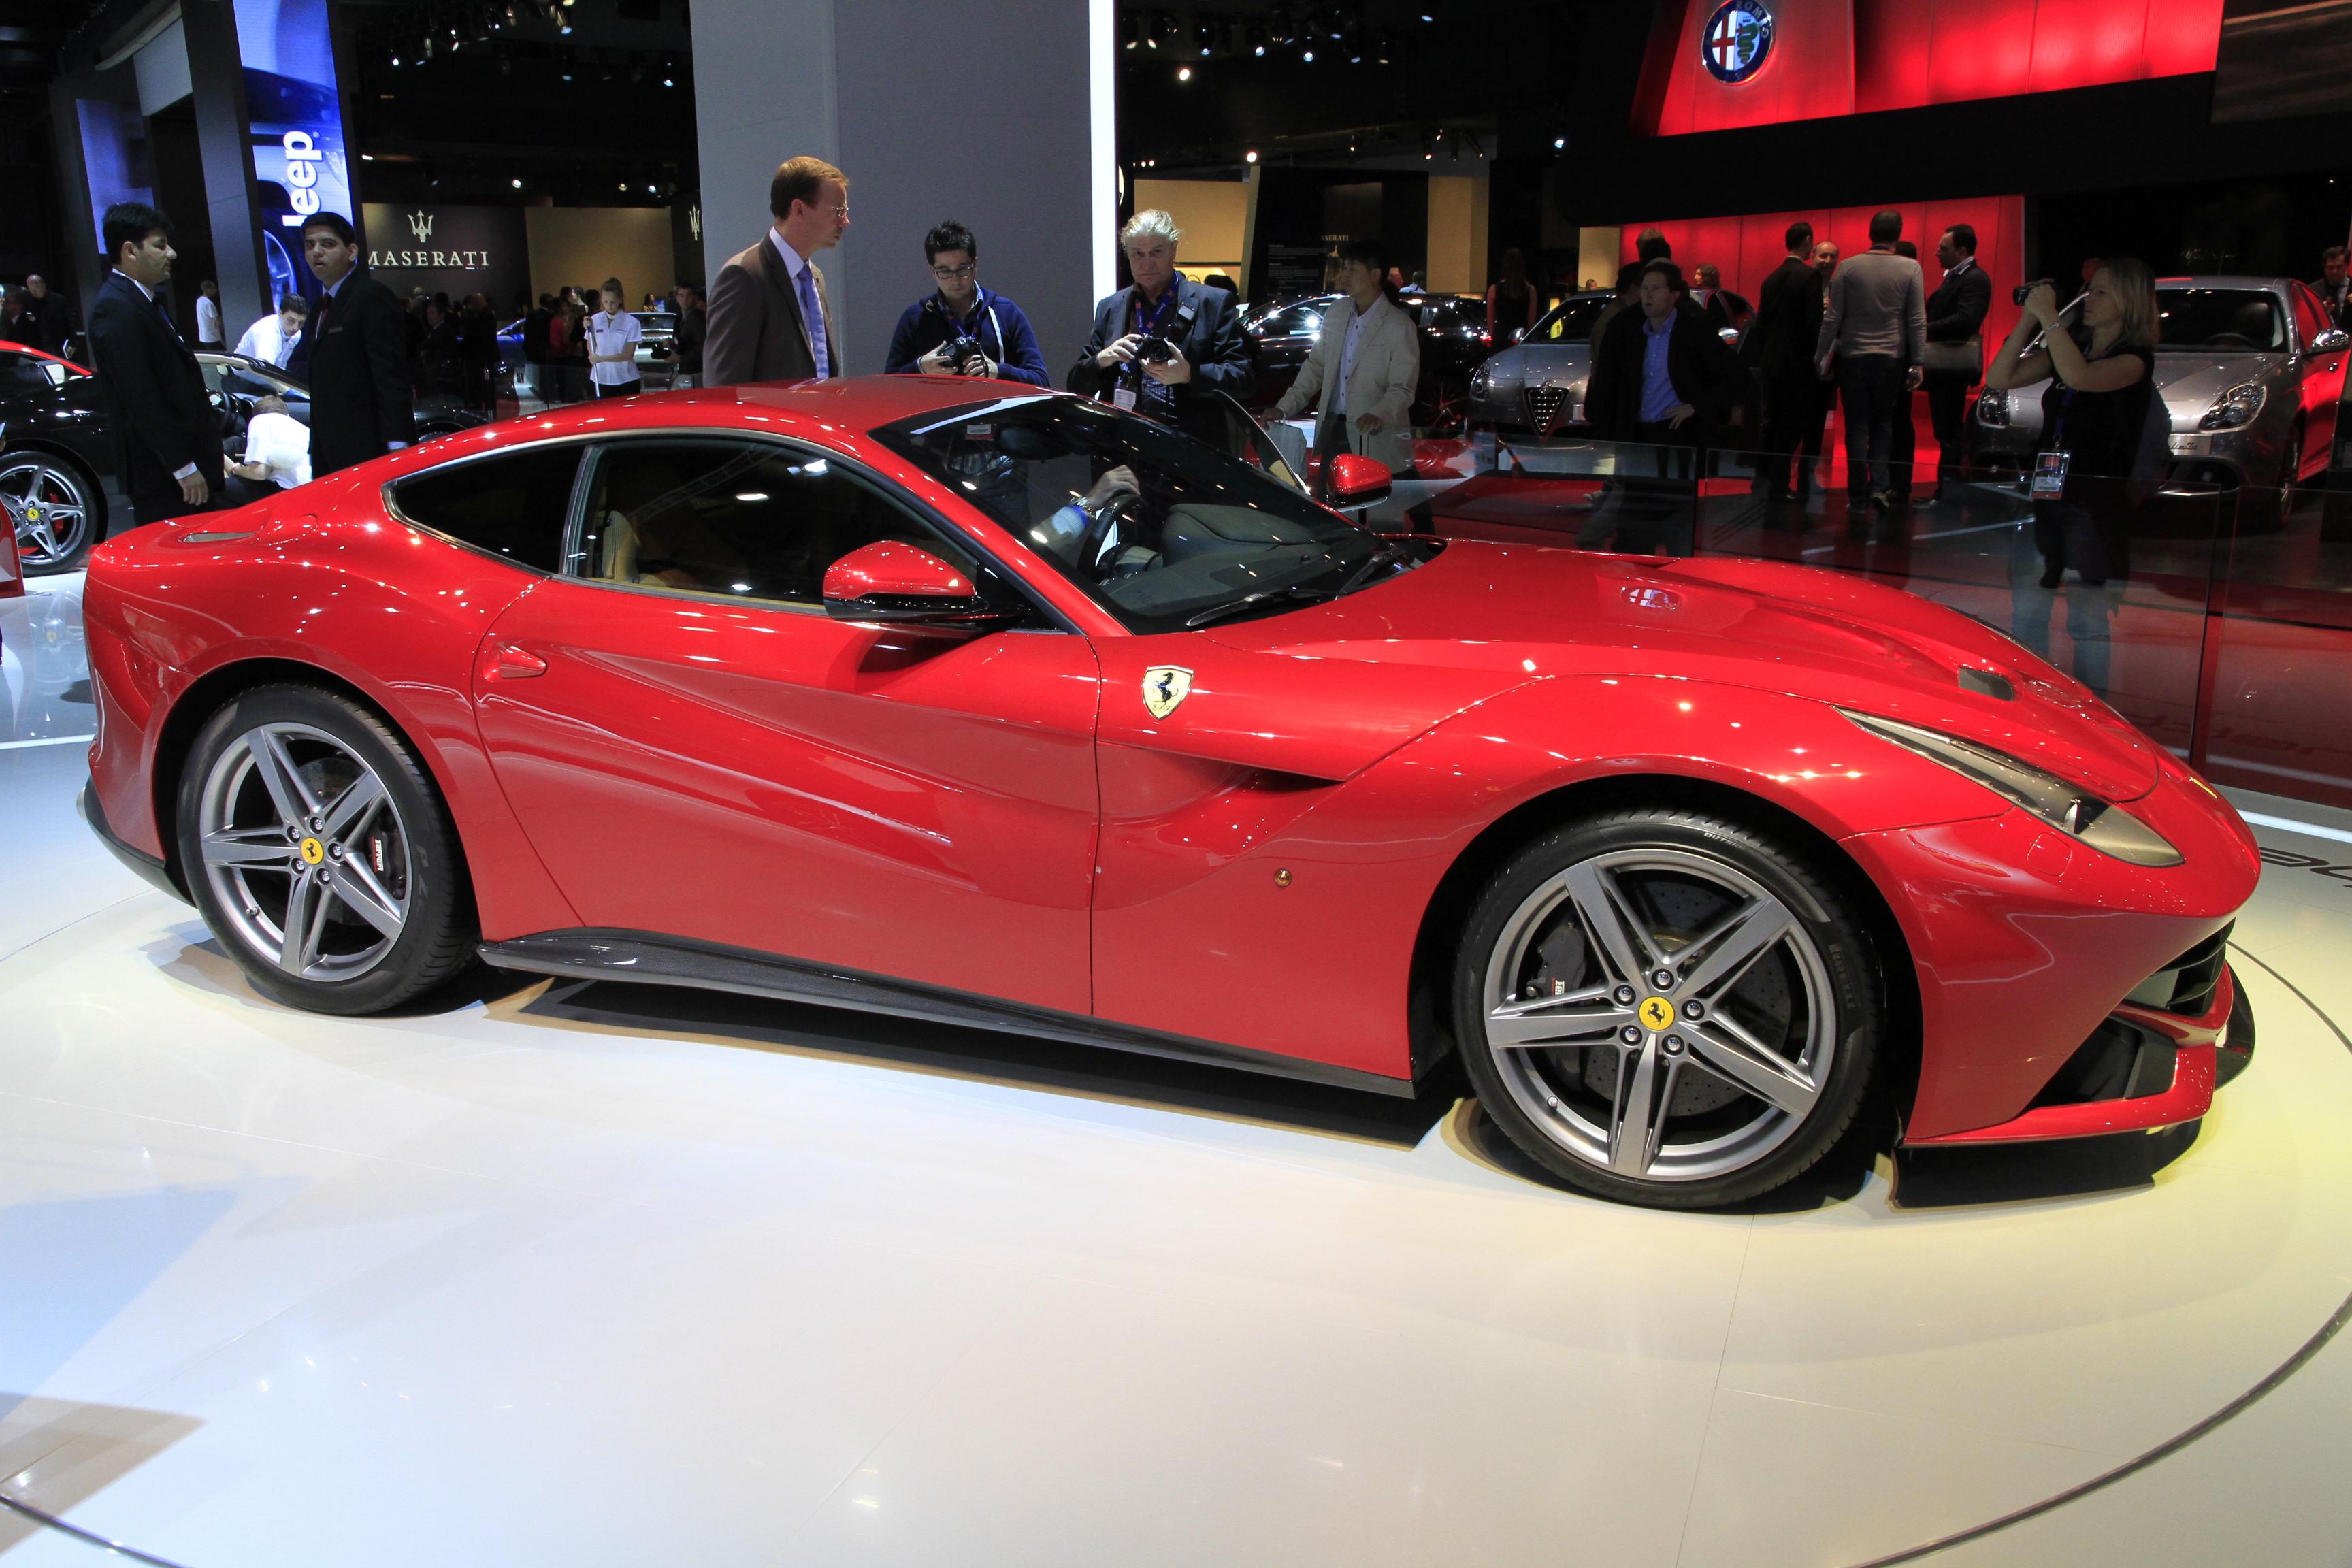 http://images.caradisiac.com/images/1/3/9/4/81394/S0-En-direct-du-Mondial-de-Paris-2012-Ferrari-F12berlinetta-273714.jpg